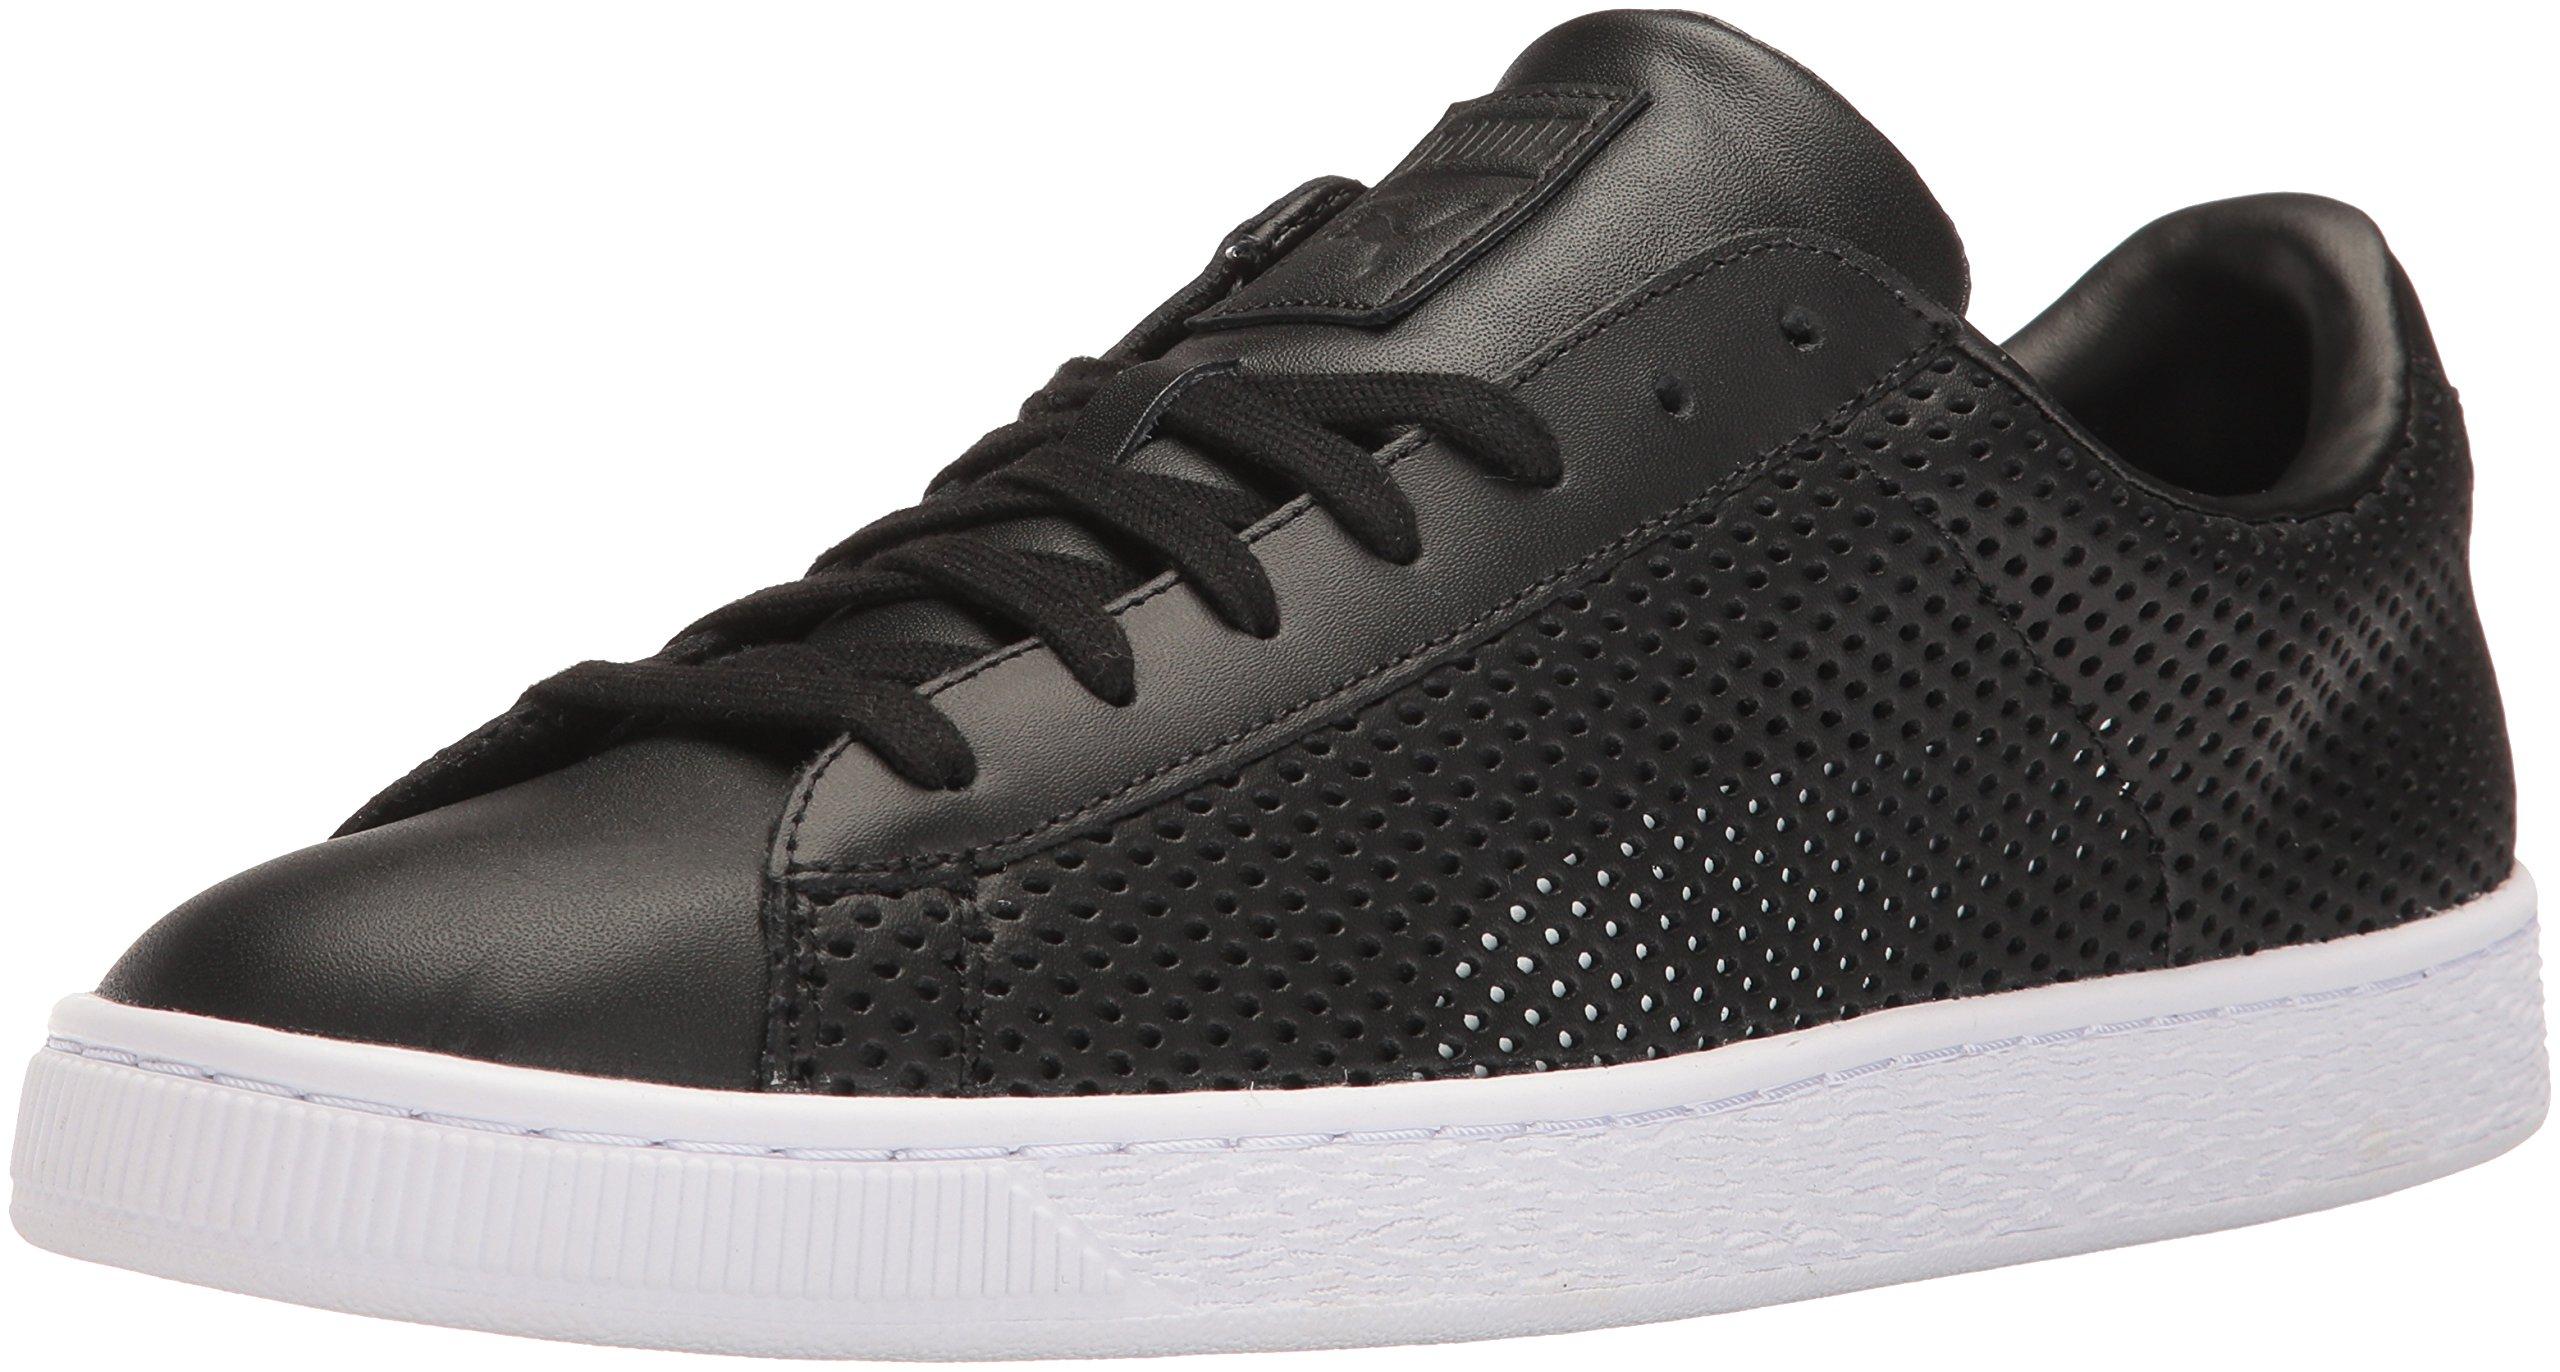 PUMA Men's Basket Classic Summer Shade Fashion Sneaker, Black, 13 M US